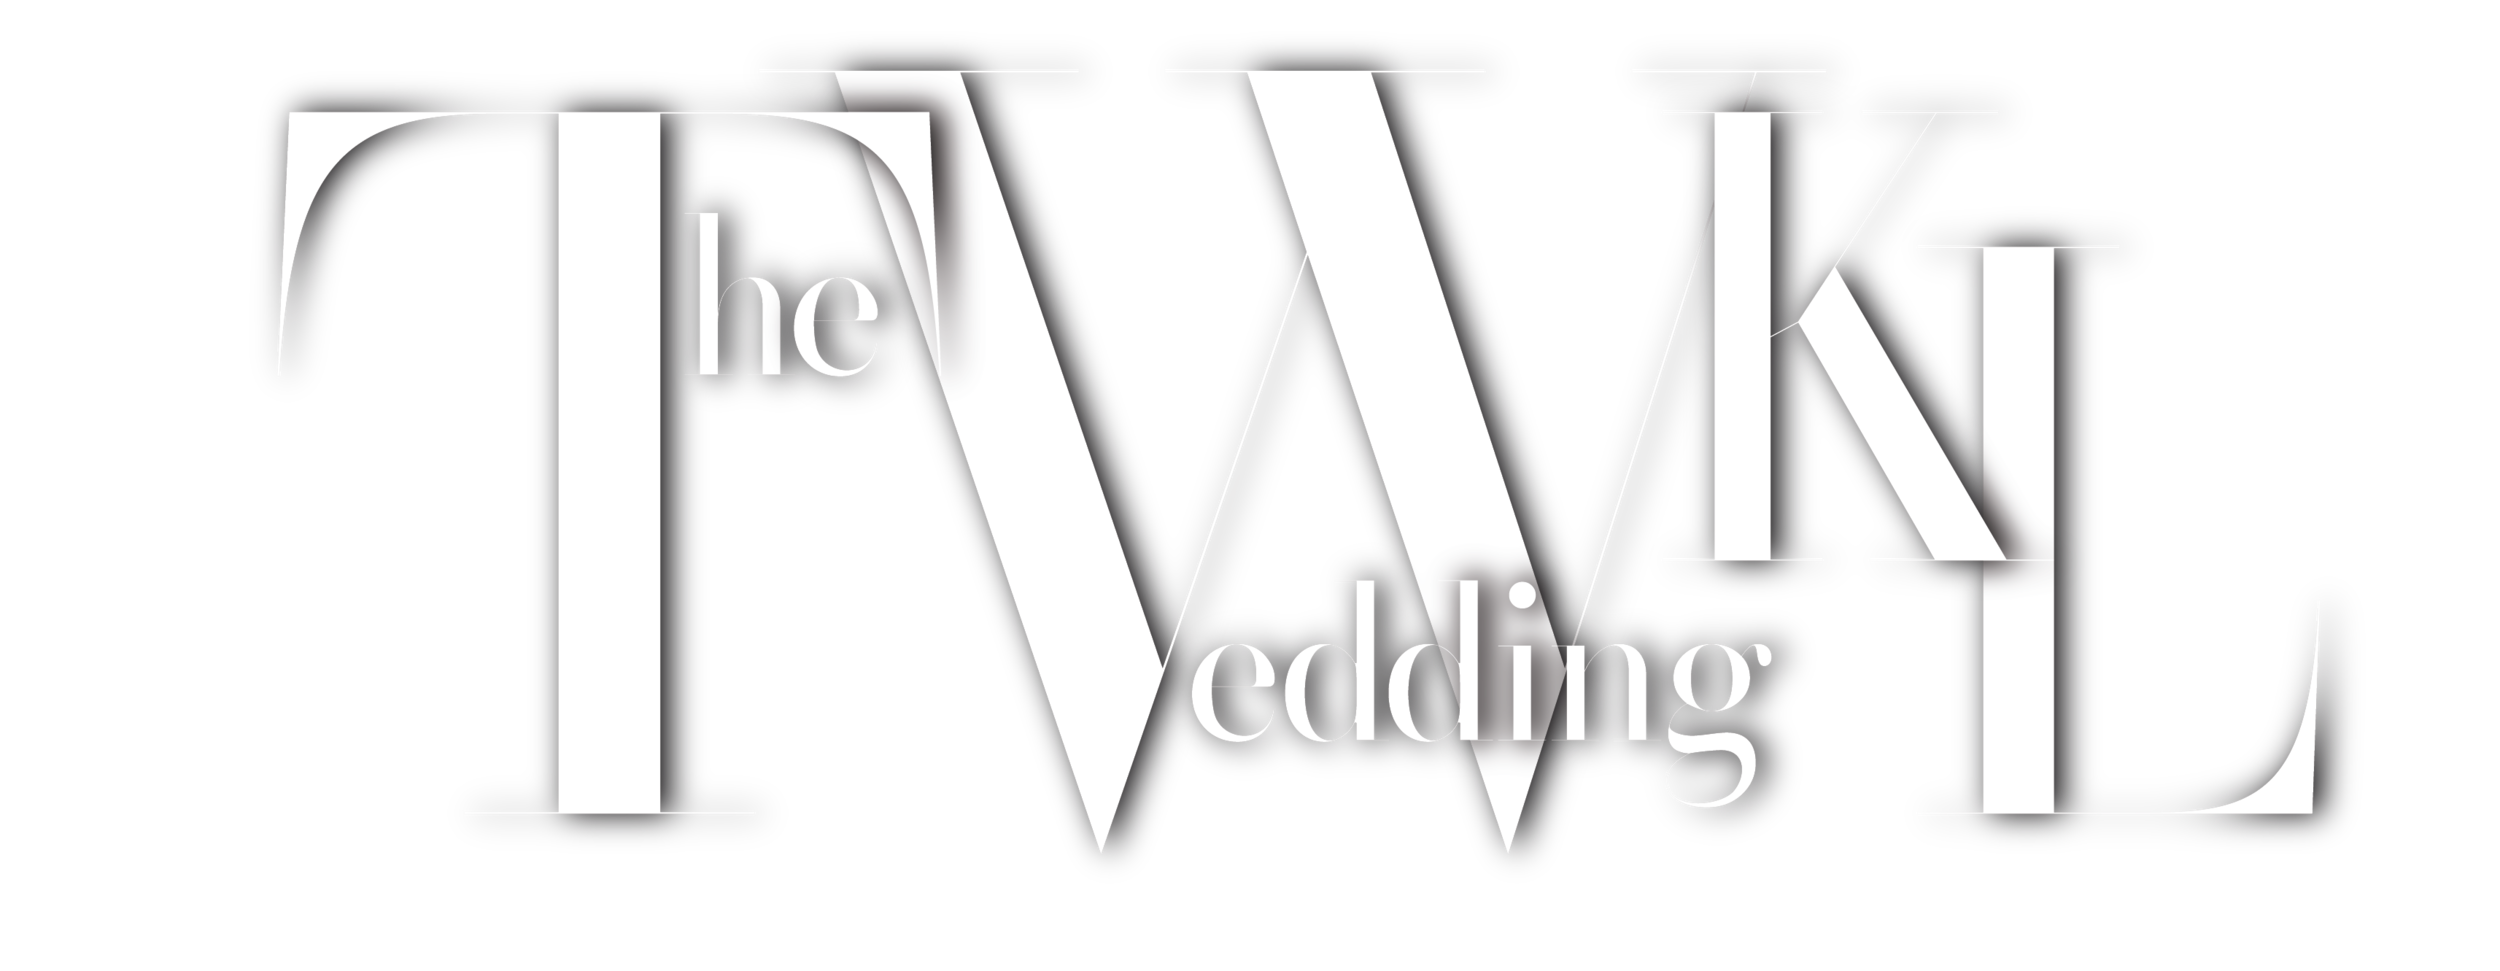 wedding kl artwork working board-03.png